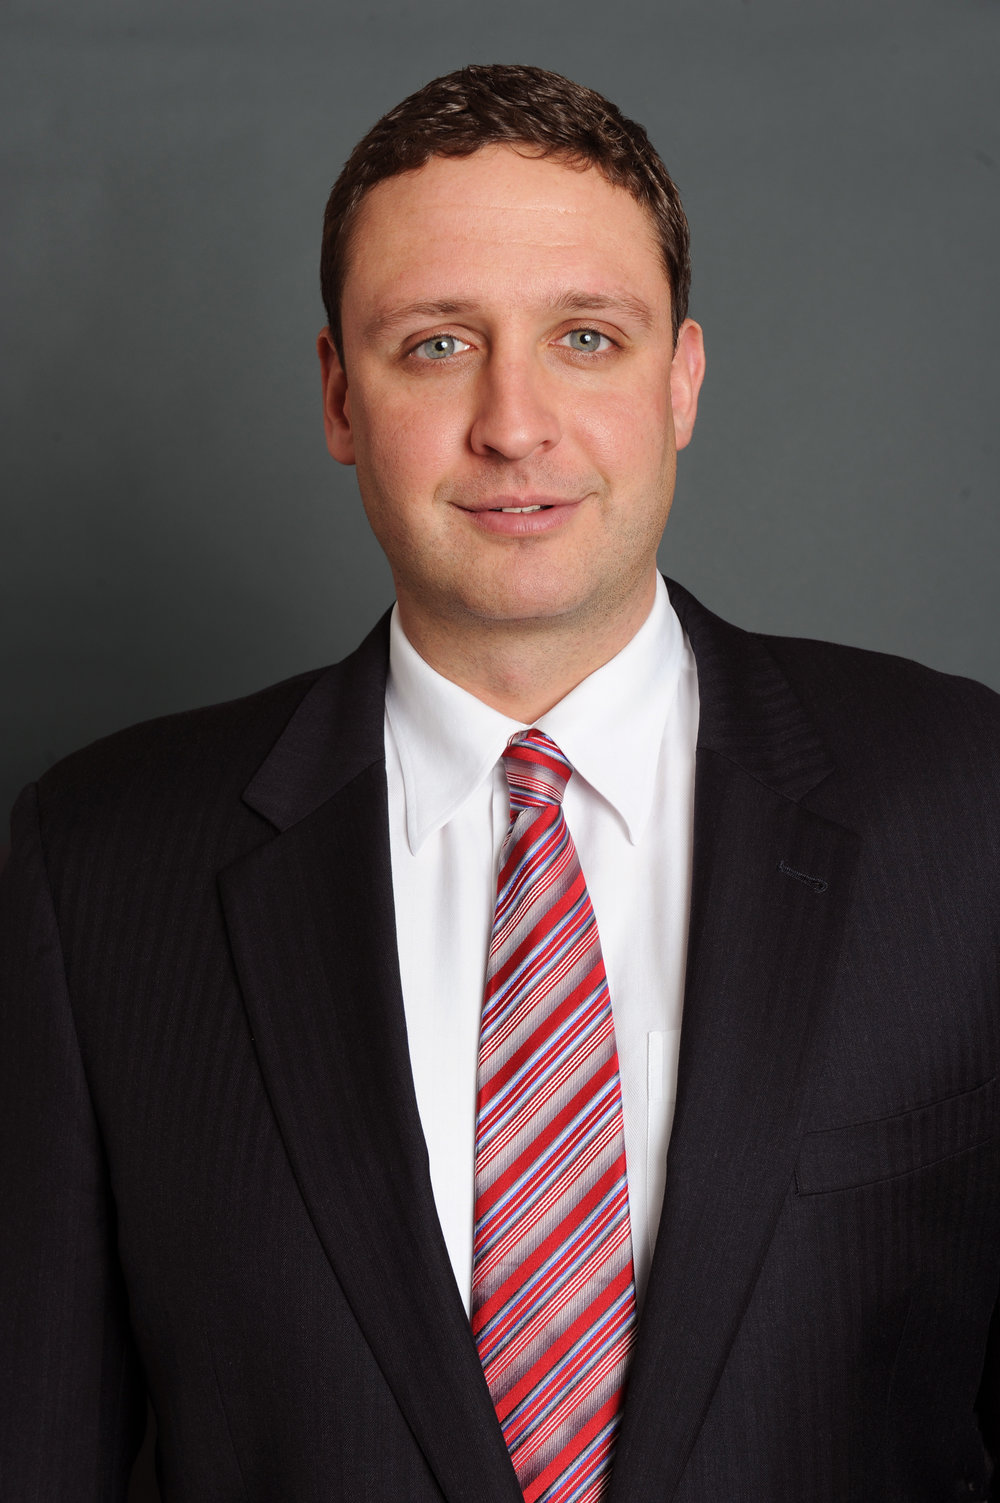 Justin Piasecki Avison Young